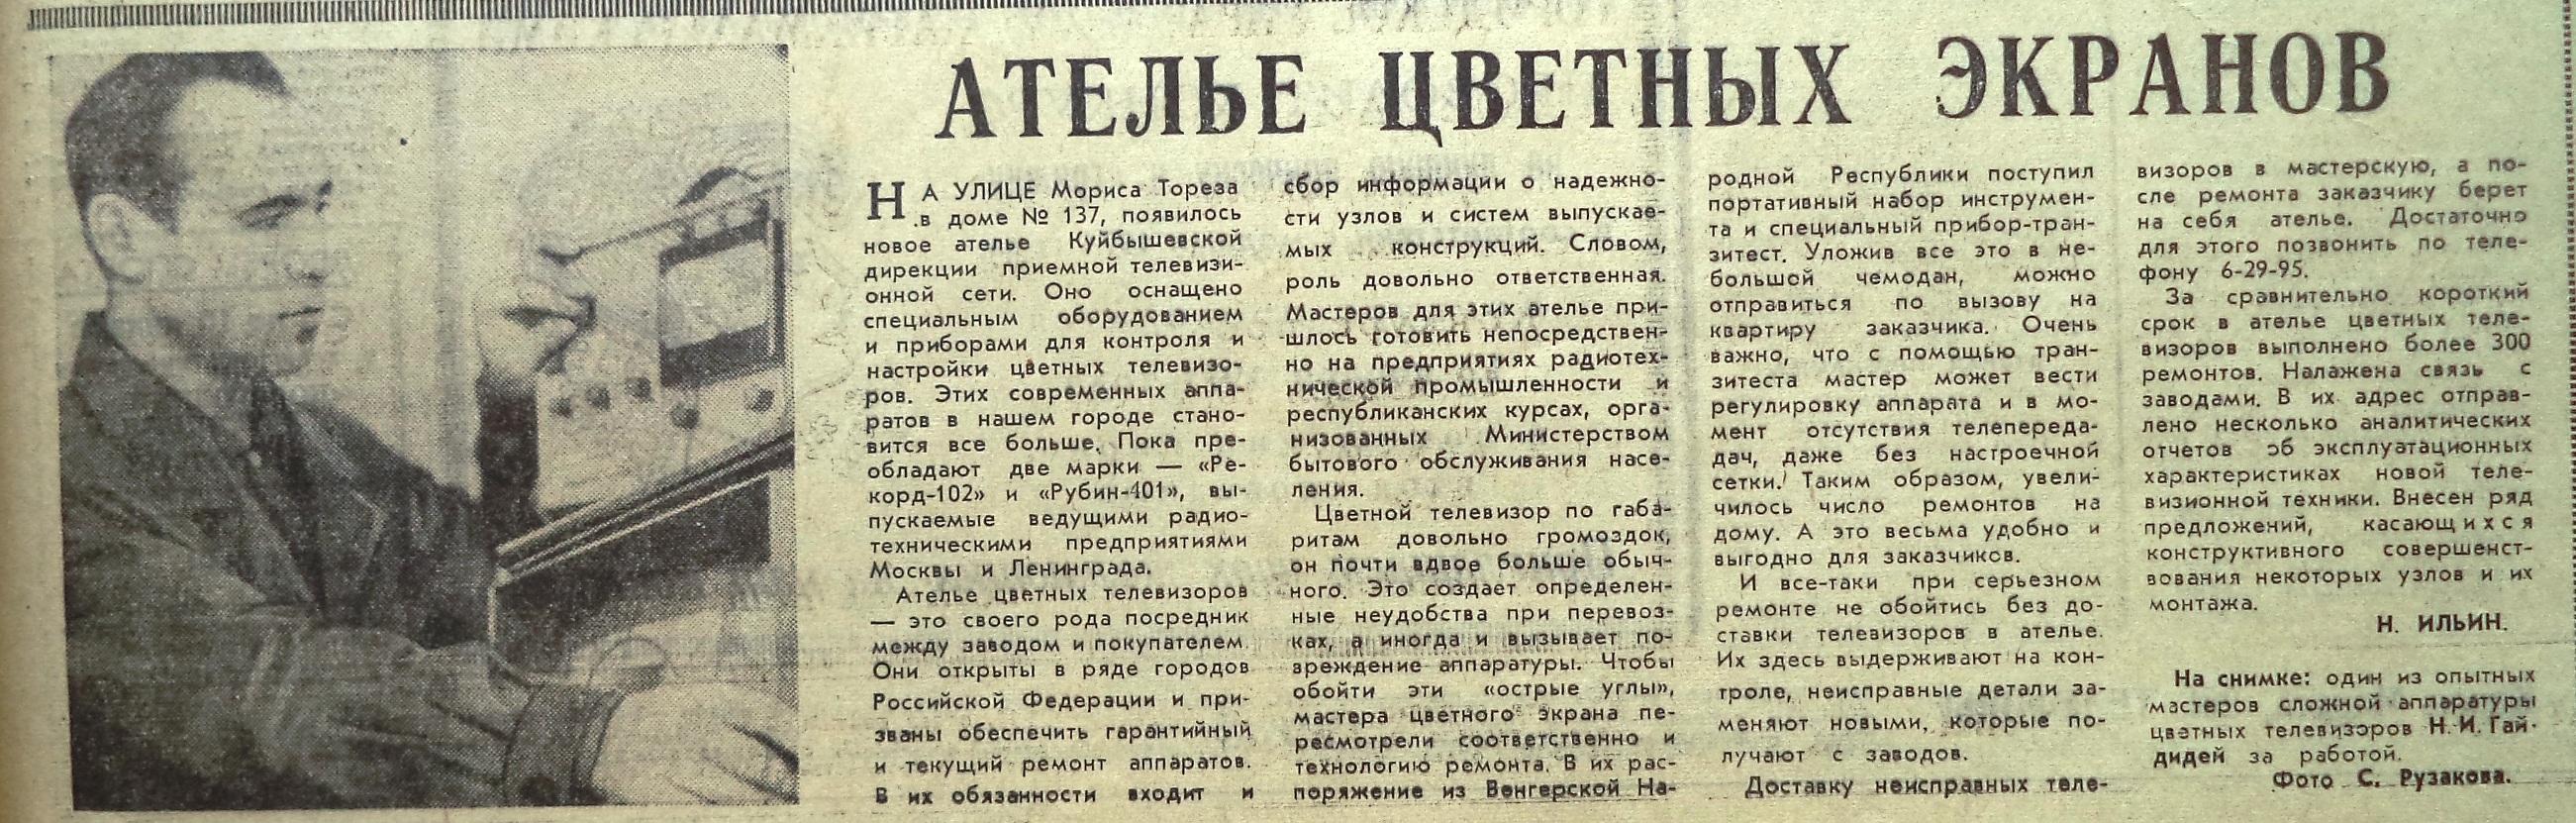 Мориса Тореза-ФОТО-70-ВЗя-1971-01-06-новое телеателье по МТ-137